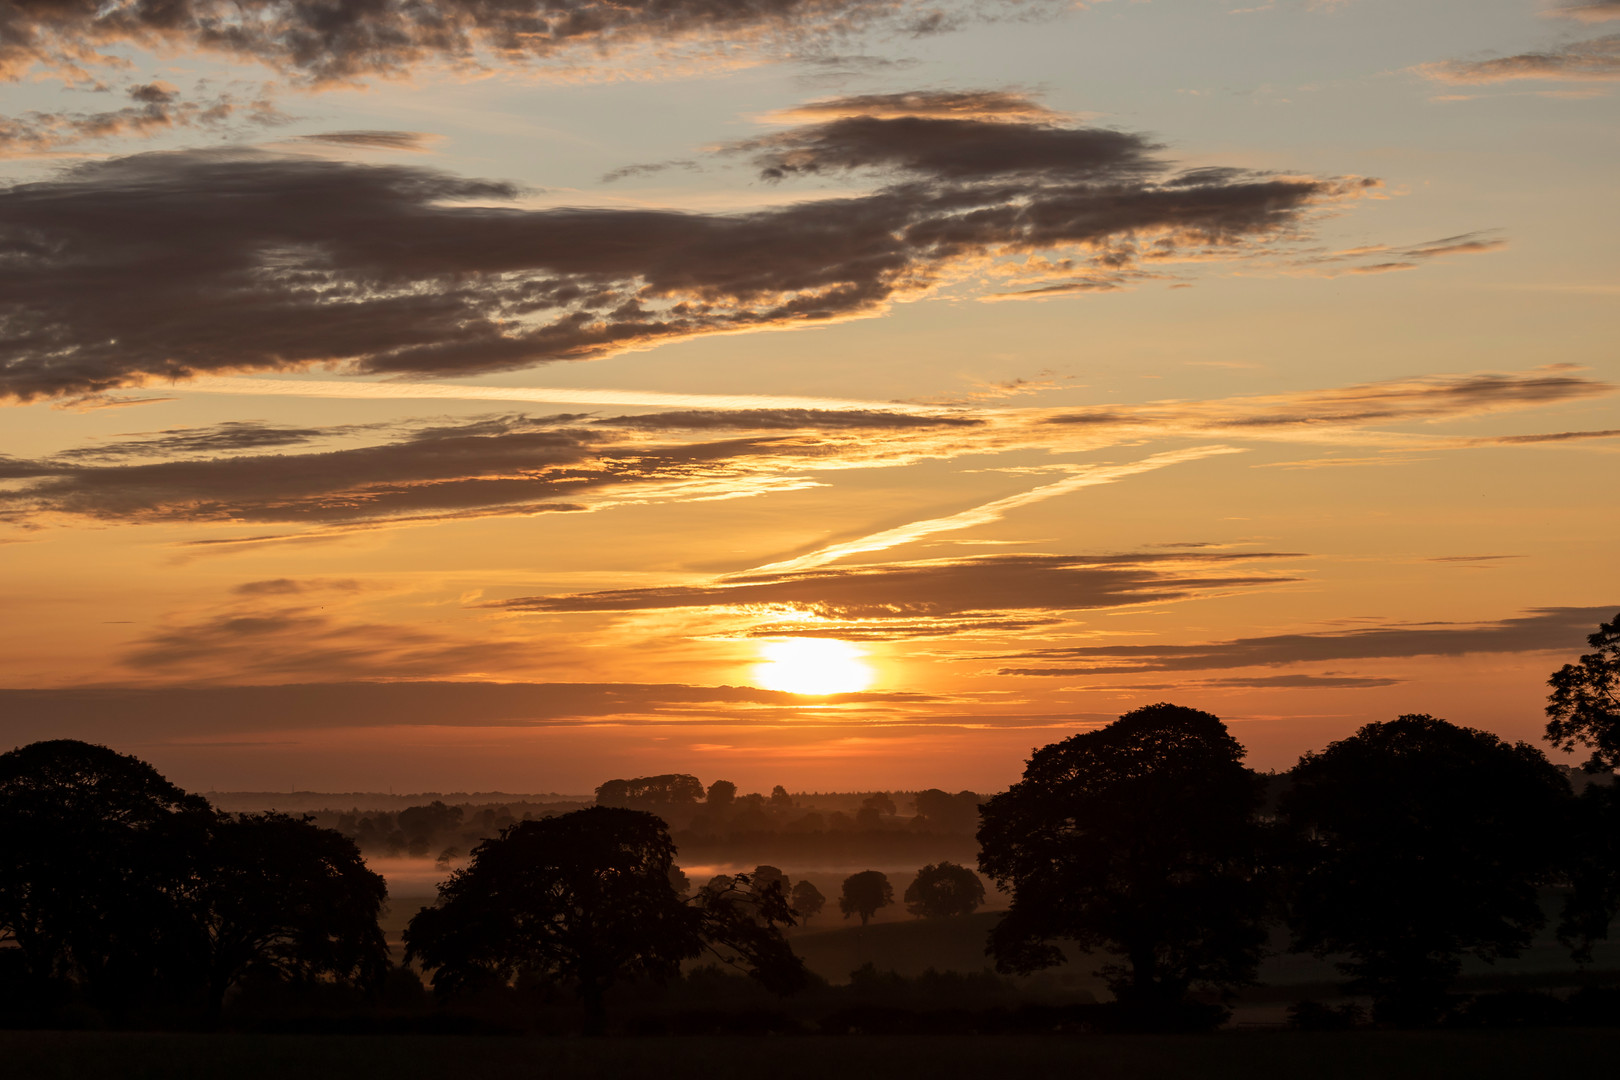 Late Summer Sunrise Along the England-Scotland Border